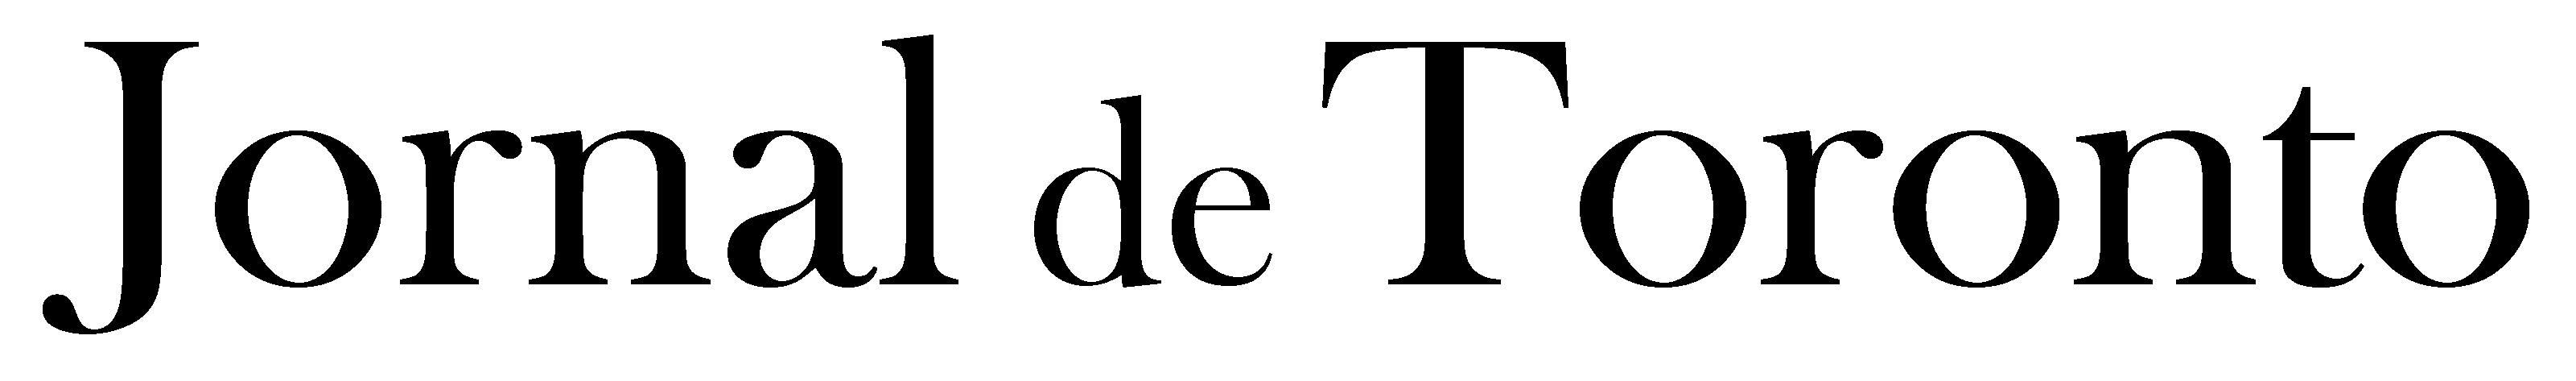 Título Jornal de Toronto